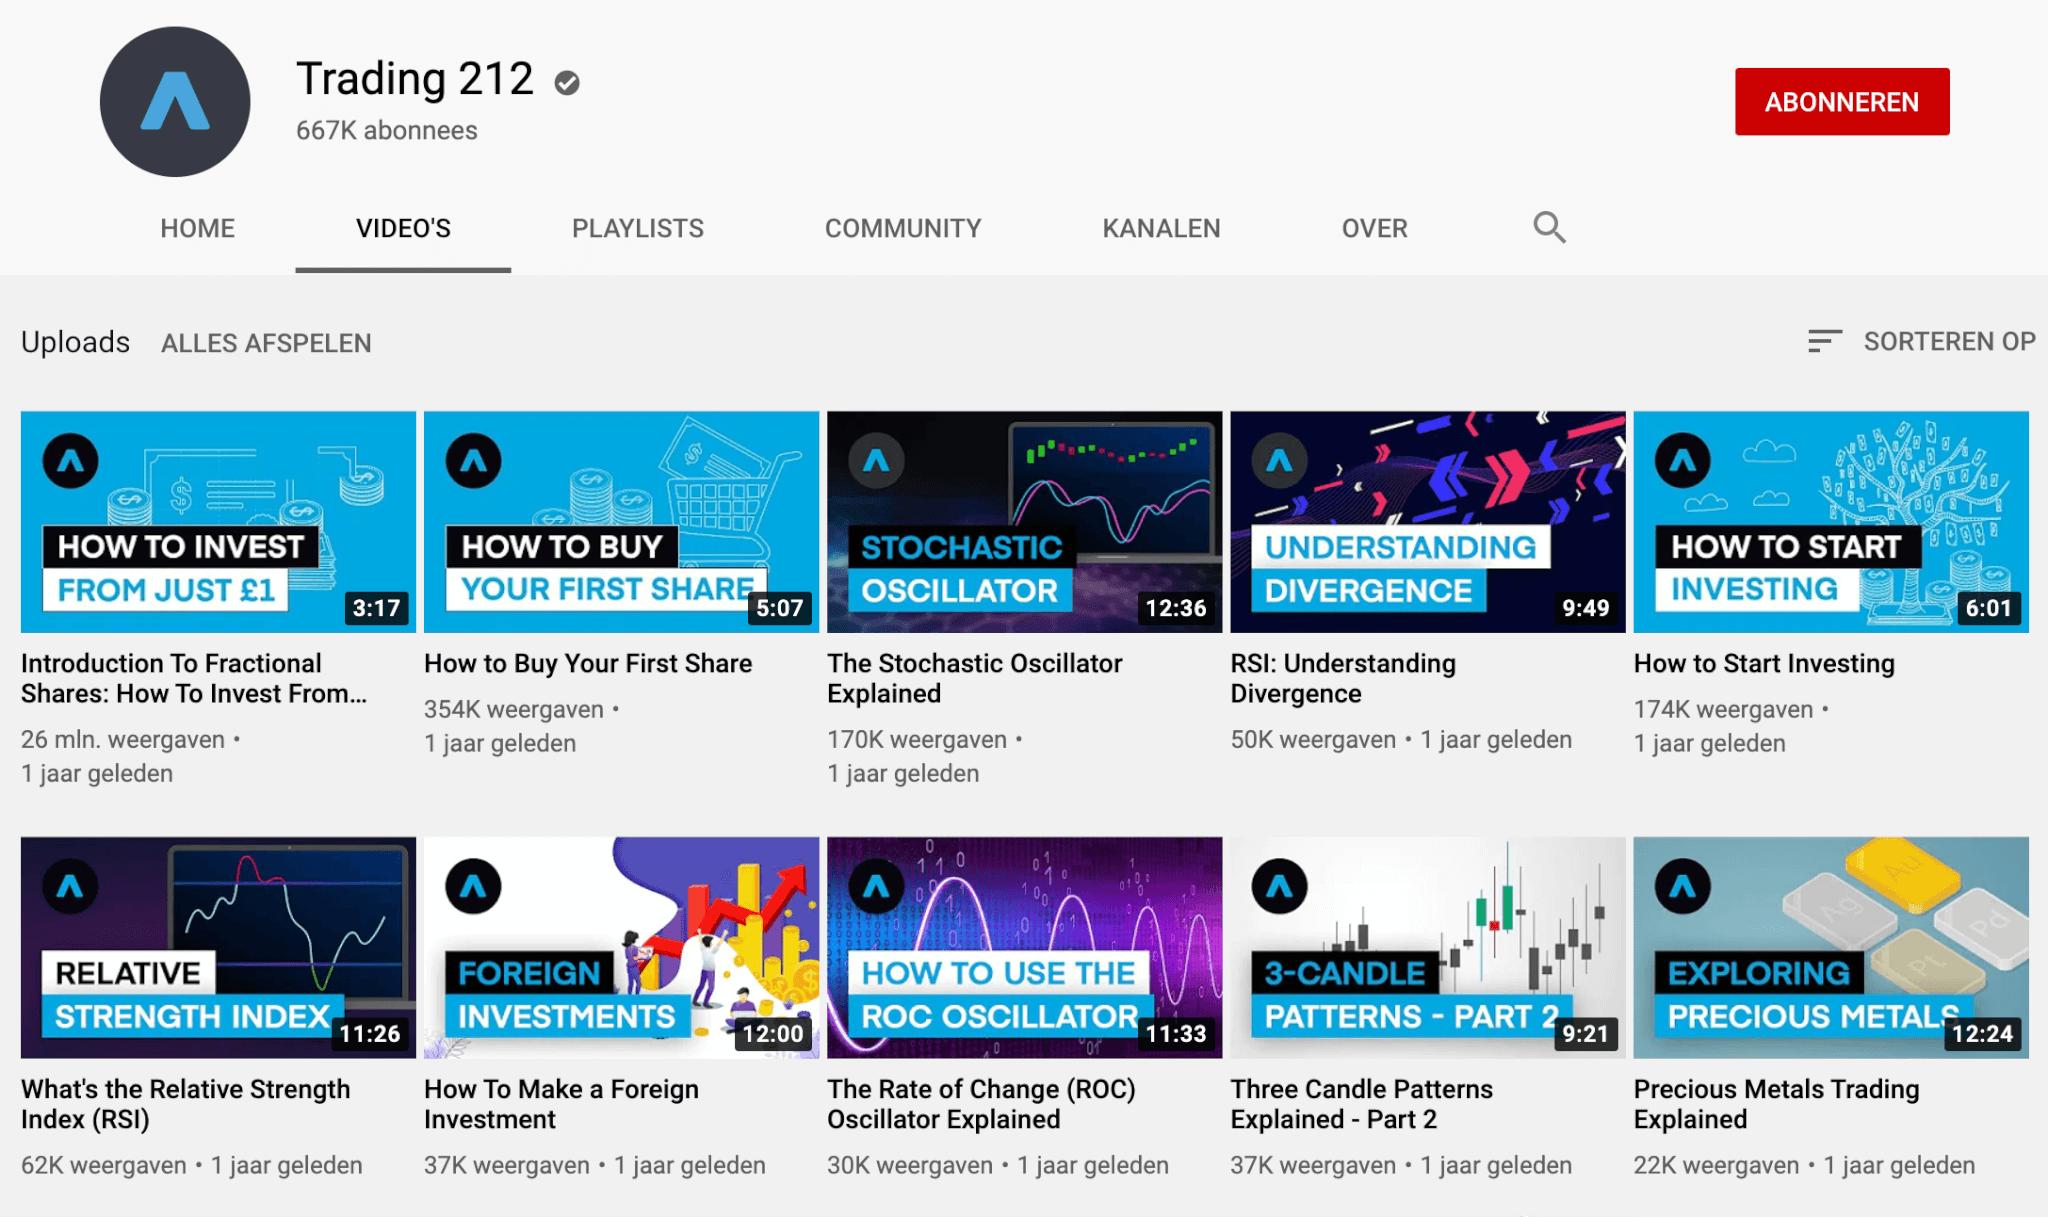 Trading 212 youtube tutorials